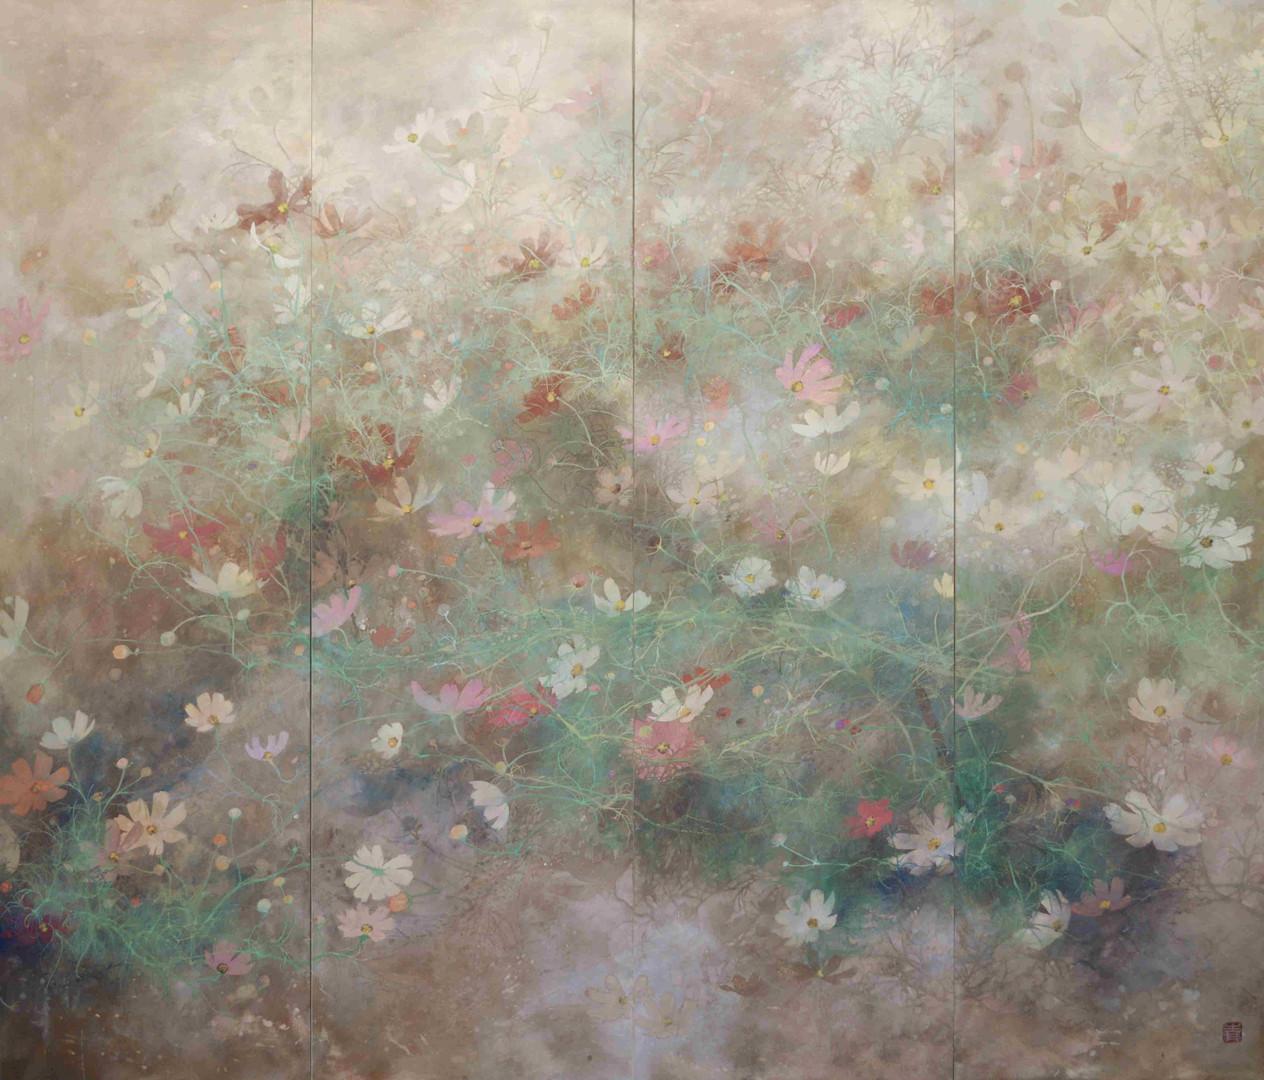 Amour - 153 x 176 cm / 2008